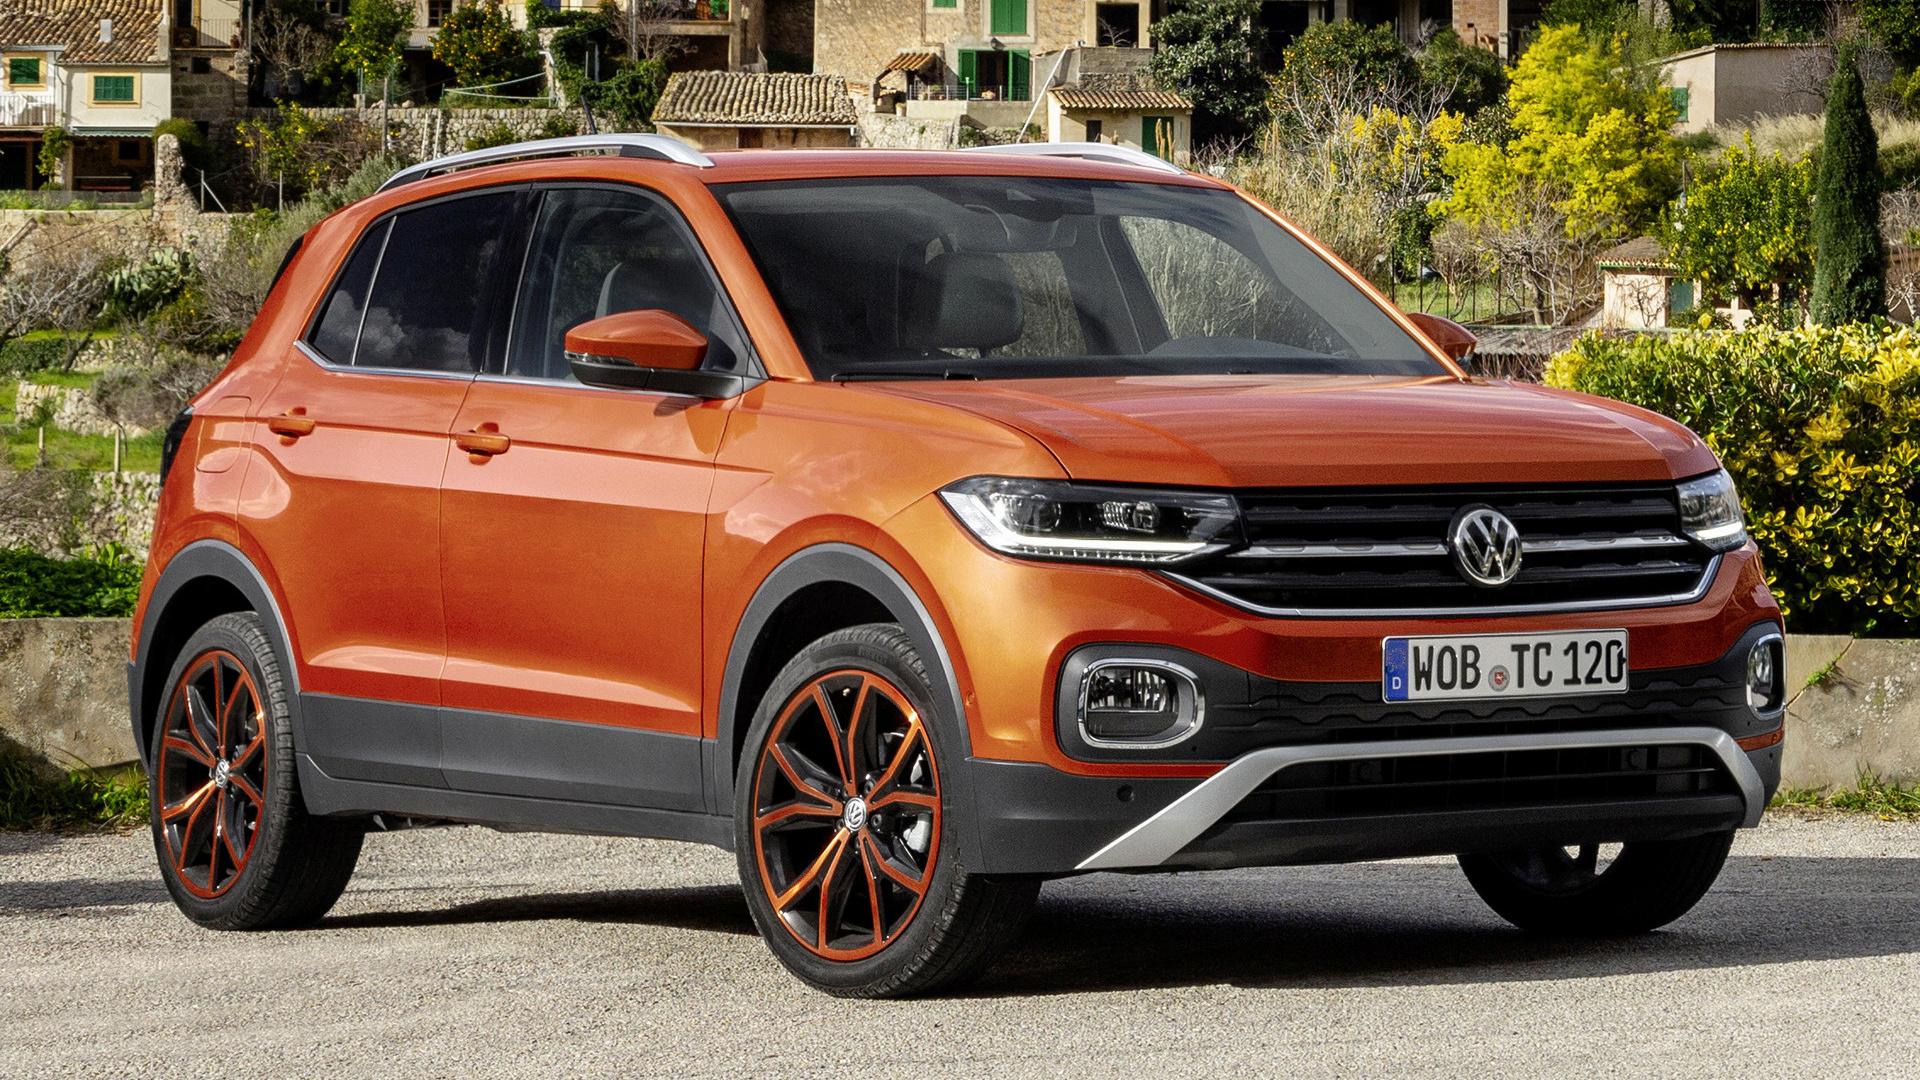 2019 Volkswagen T-Cross - Wallpapers and HD Images | Car Pixel